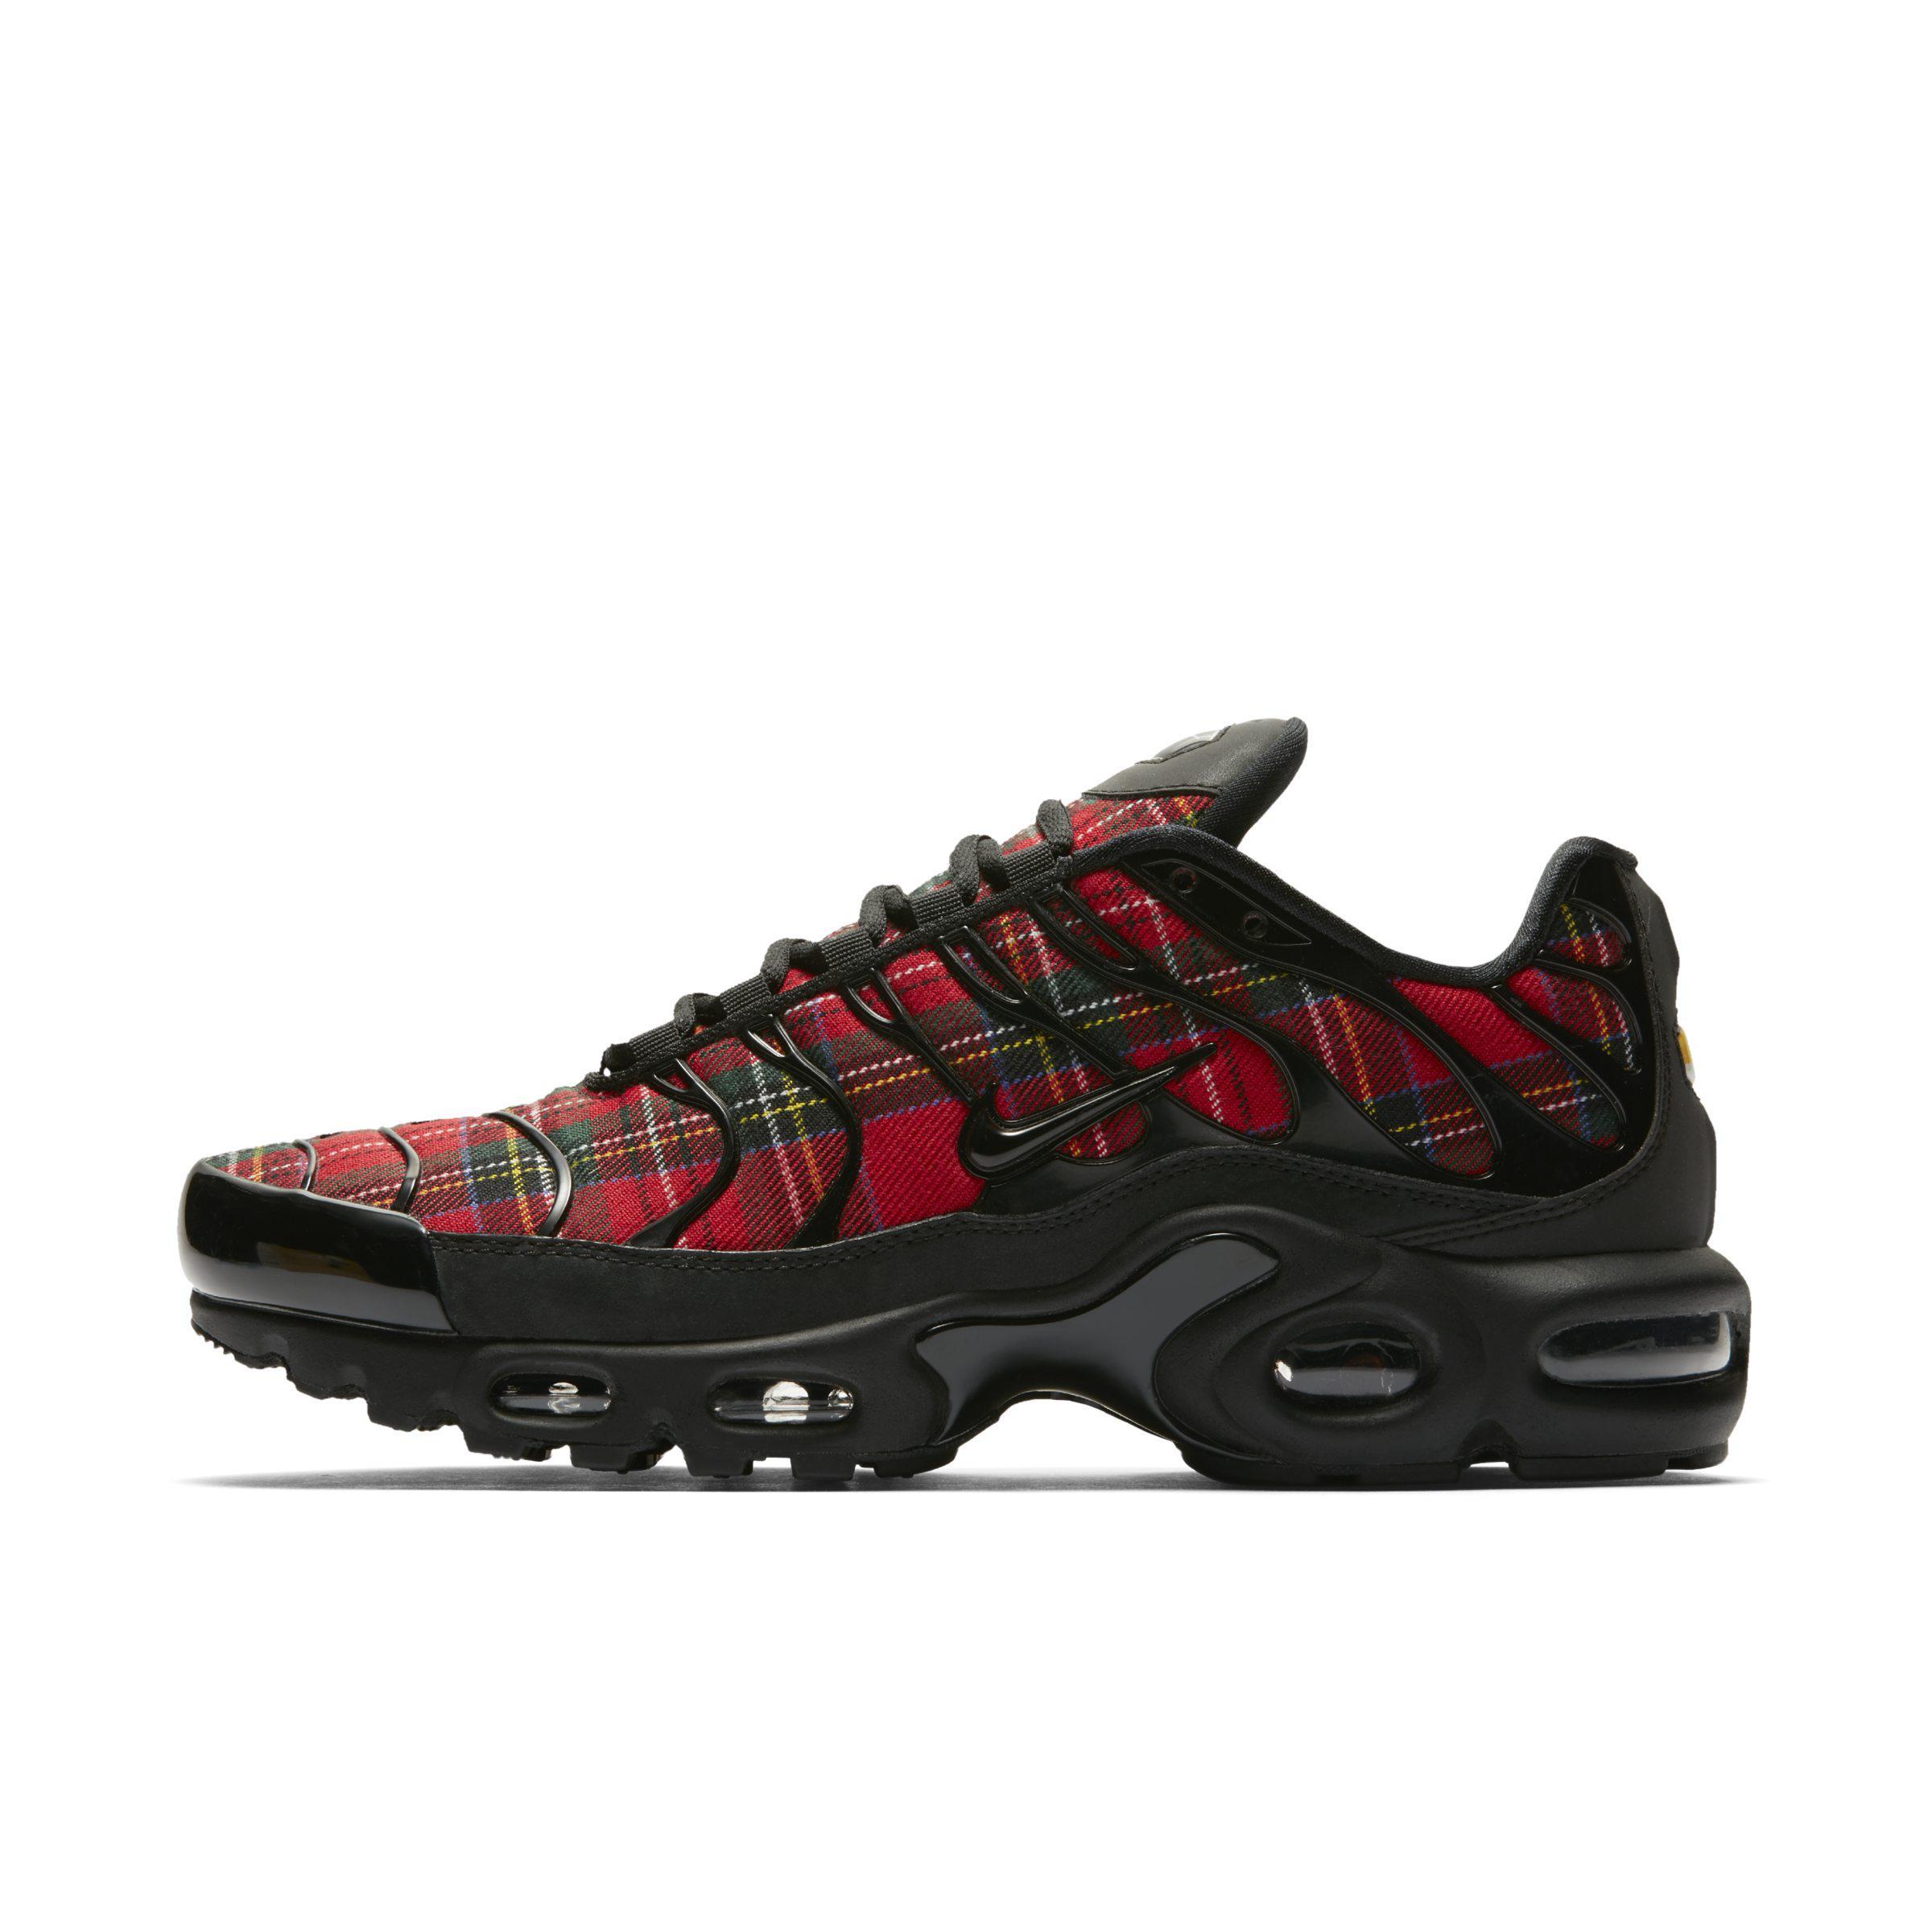 9c8098d04e Nike Air Max Plus Tn Se Tartan Shoe in Black - Lyst